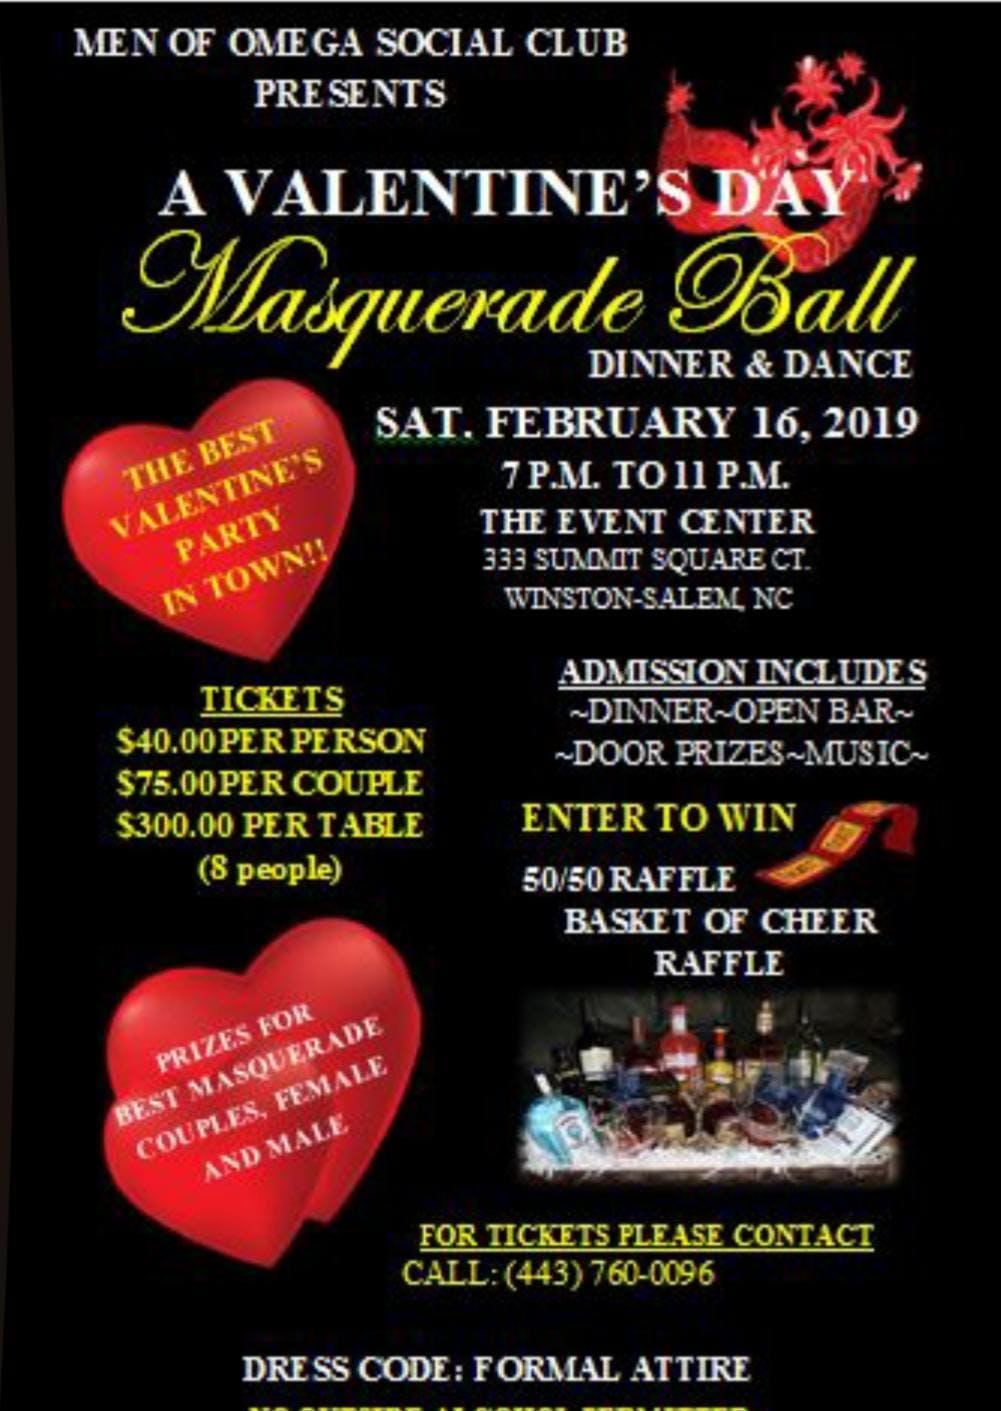 Valentines Masquerade Ball at The Event Center, Winston Salem